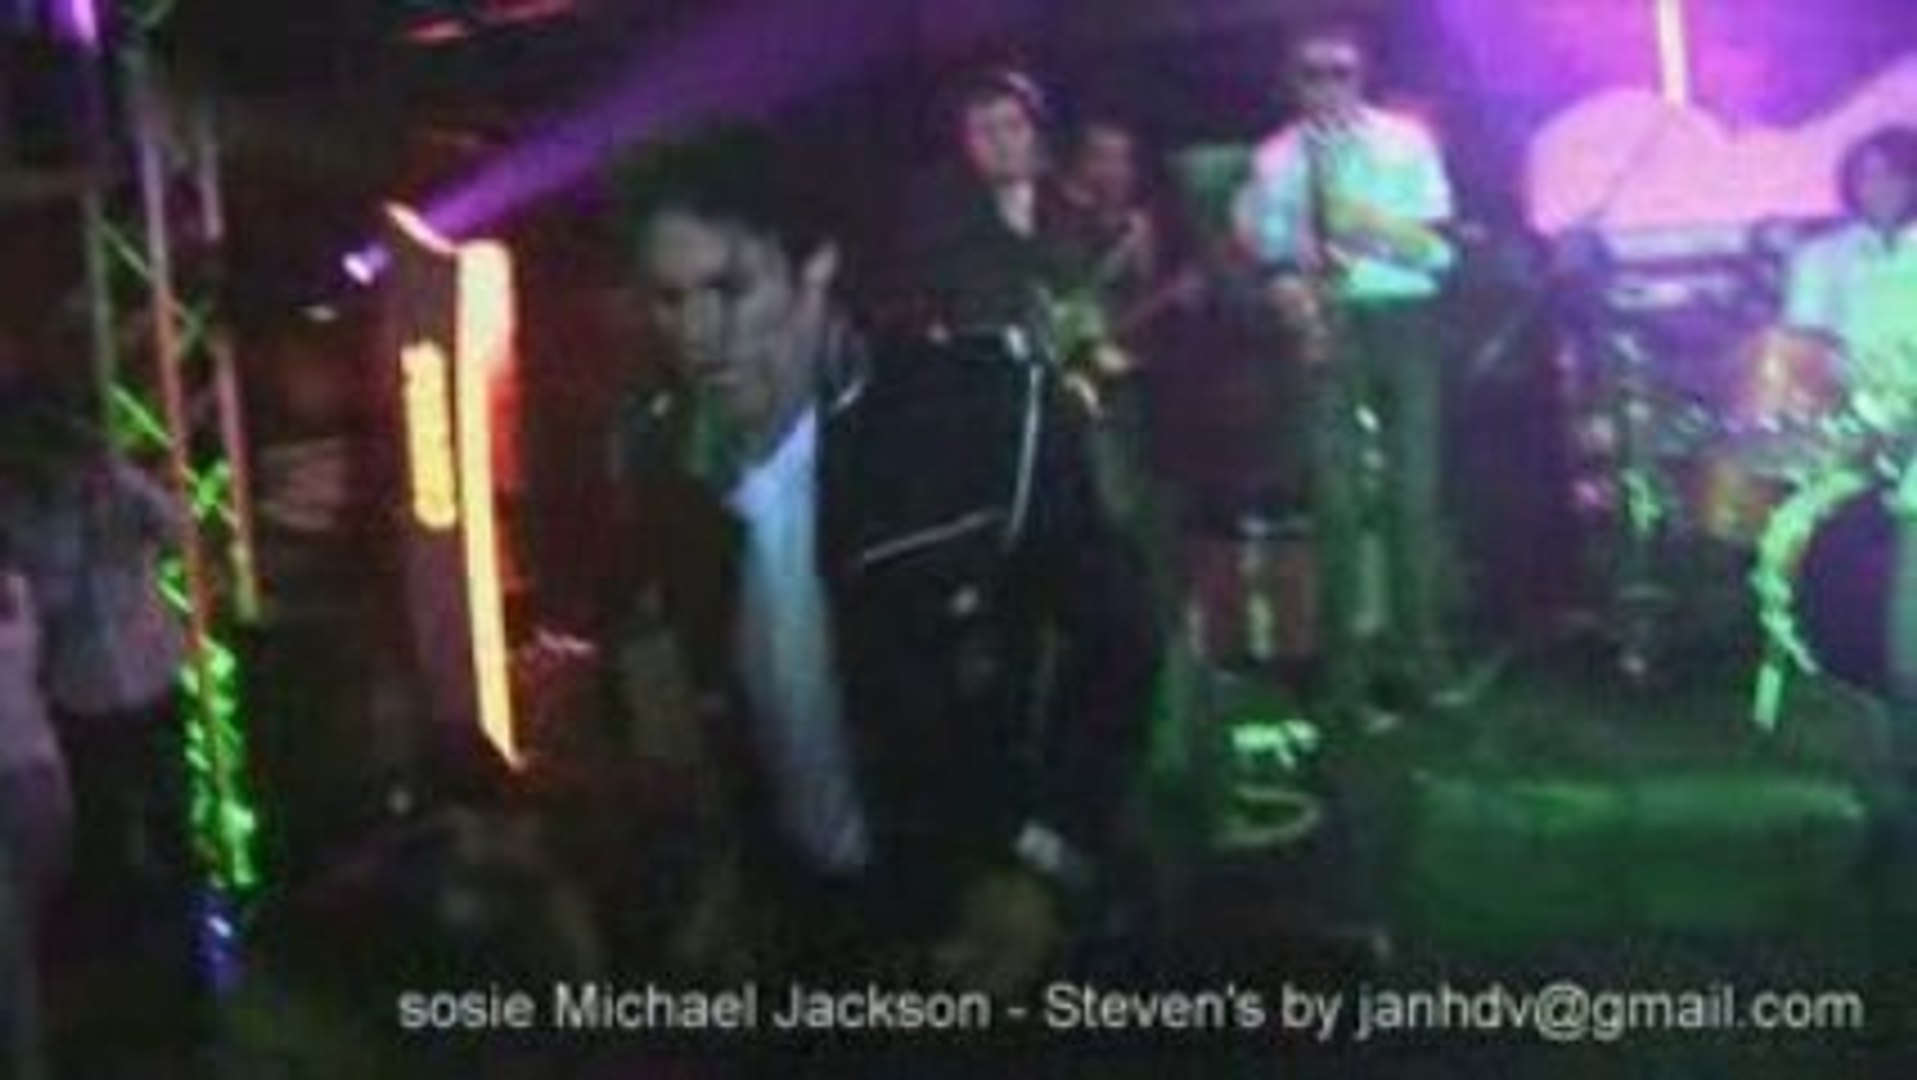 Michael Jackson sosie Steven 7 julliet 2009 hommage